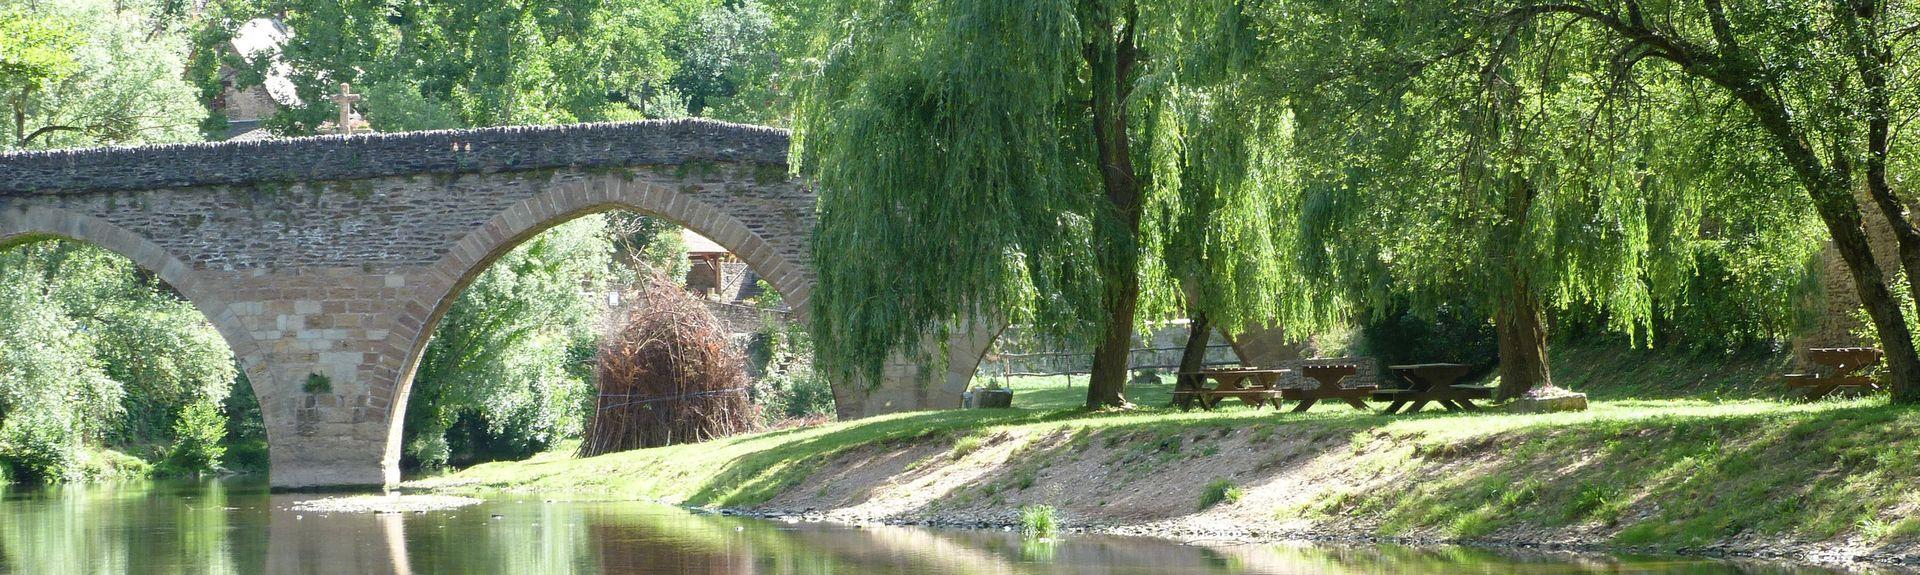 Rignac, Pays Rignacois, Occitanie, France